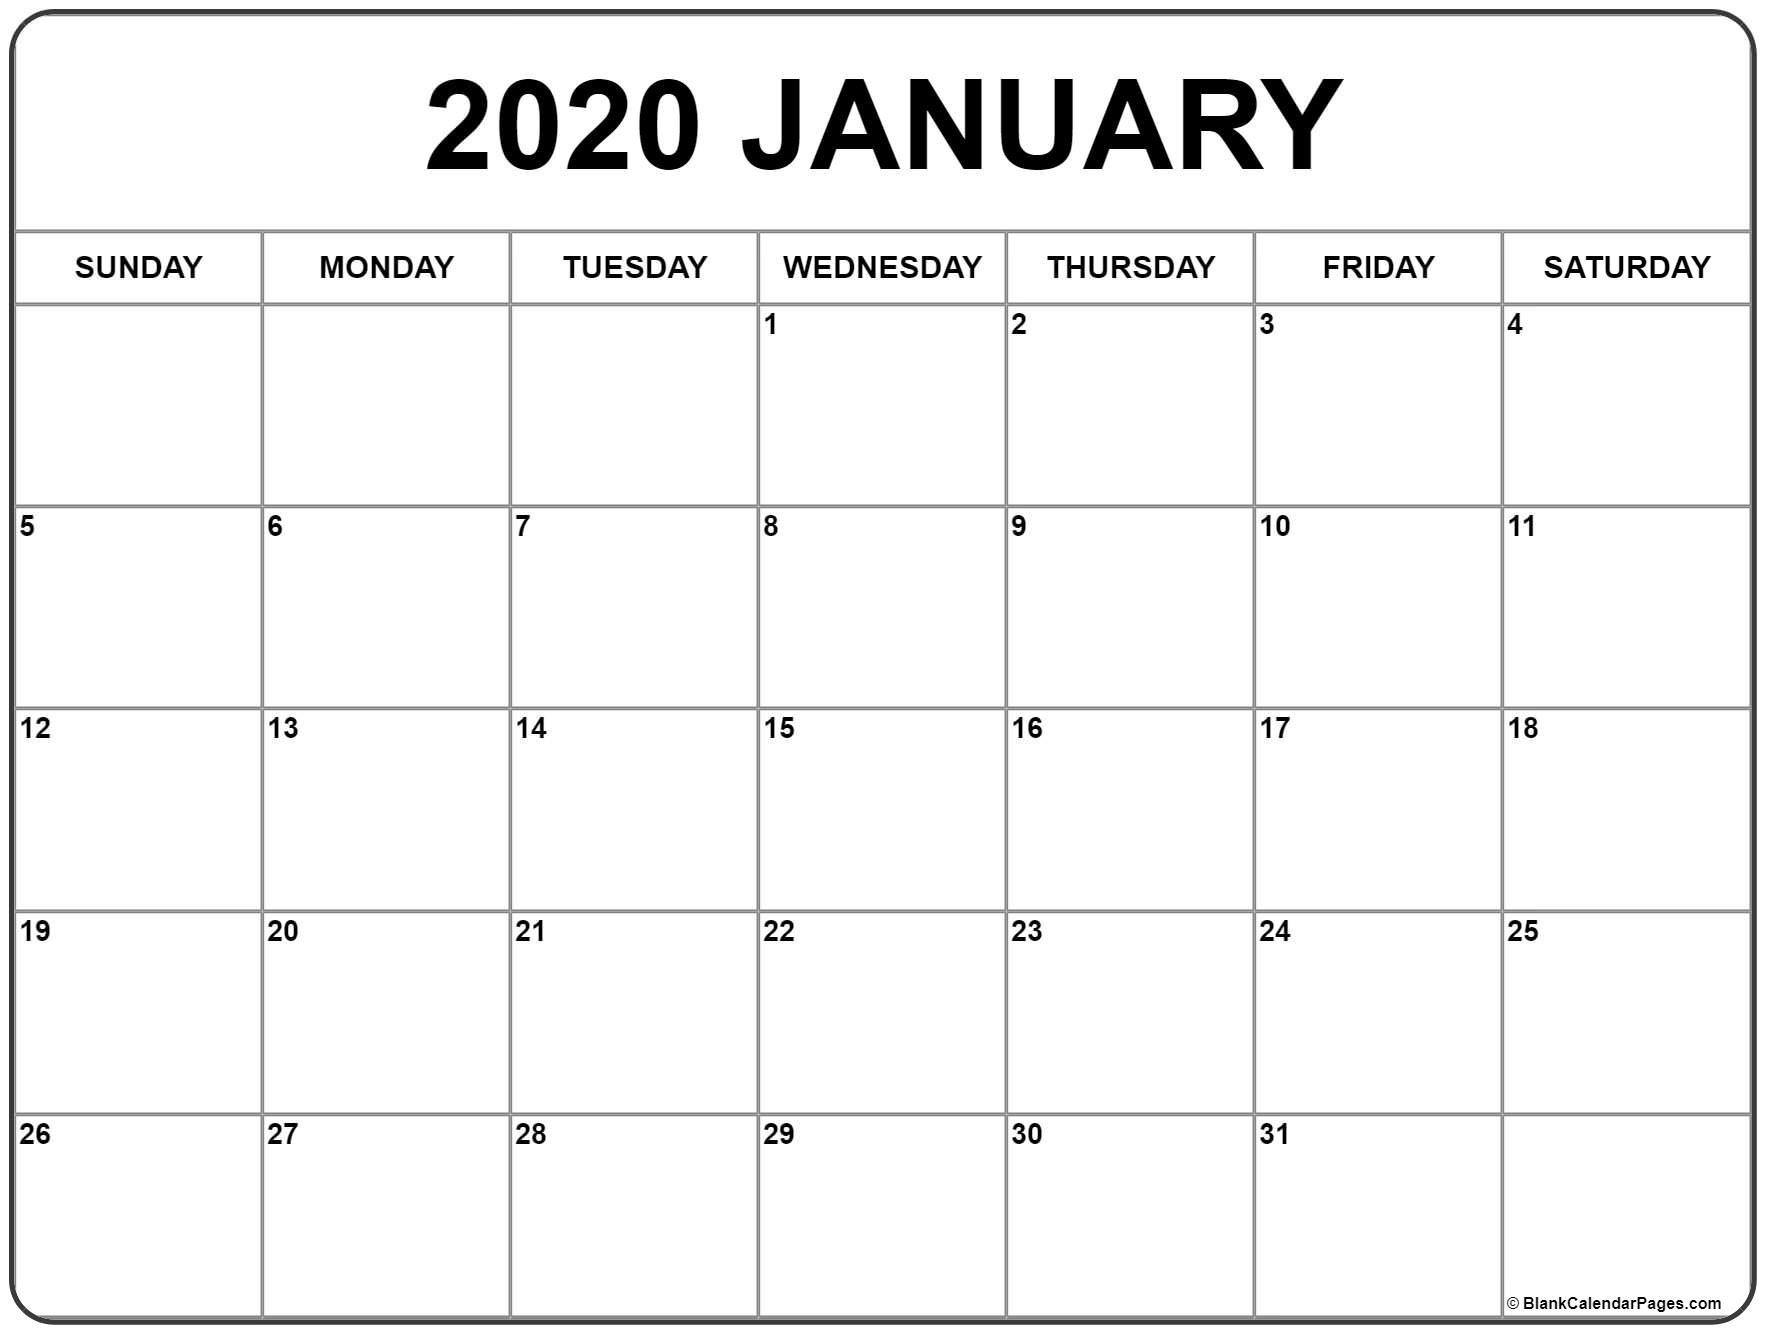 January 2020 Calendar | Free Printable Monthly Calendars  Calendar Template 2020 Printable Free